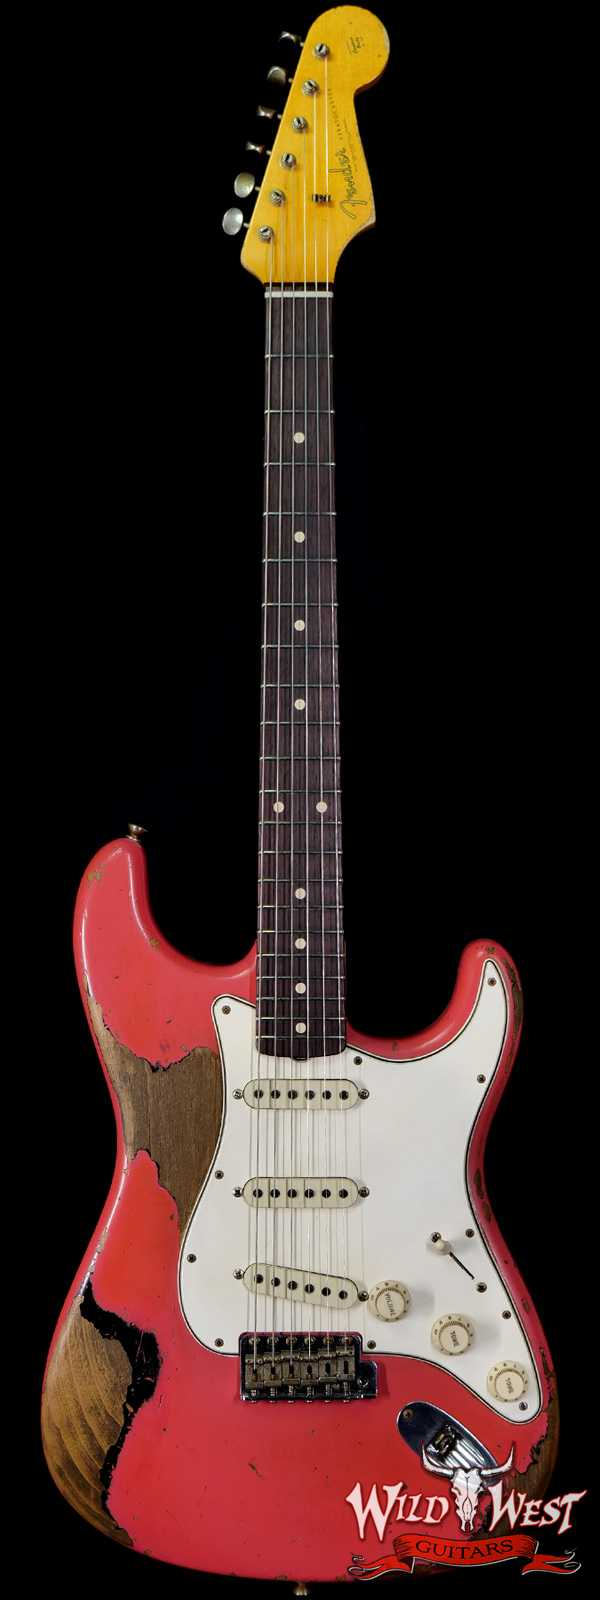 Fender Custom Shop Ron Thorn Masterbuilt 1964 Stratocaster Josefina Hand-Wound Pickups Heavy Relic Fiesta Red over Black